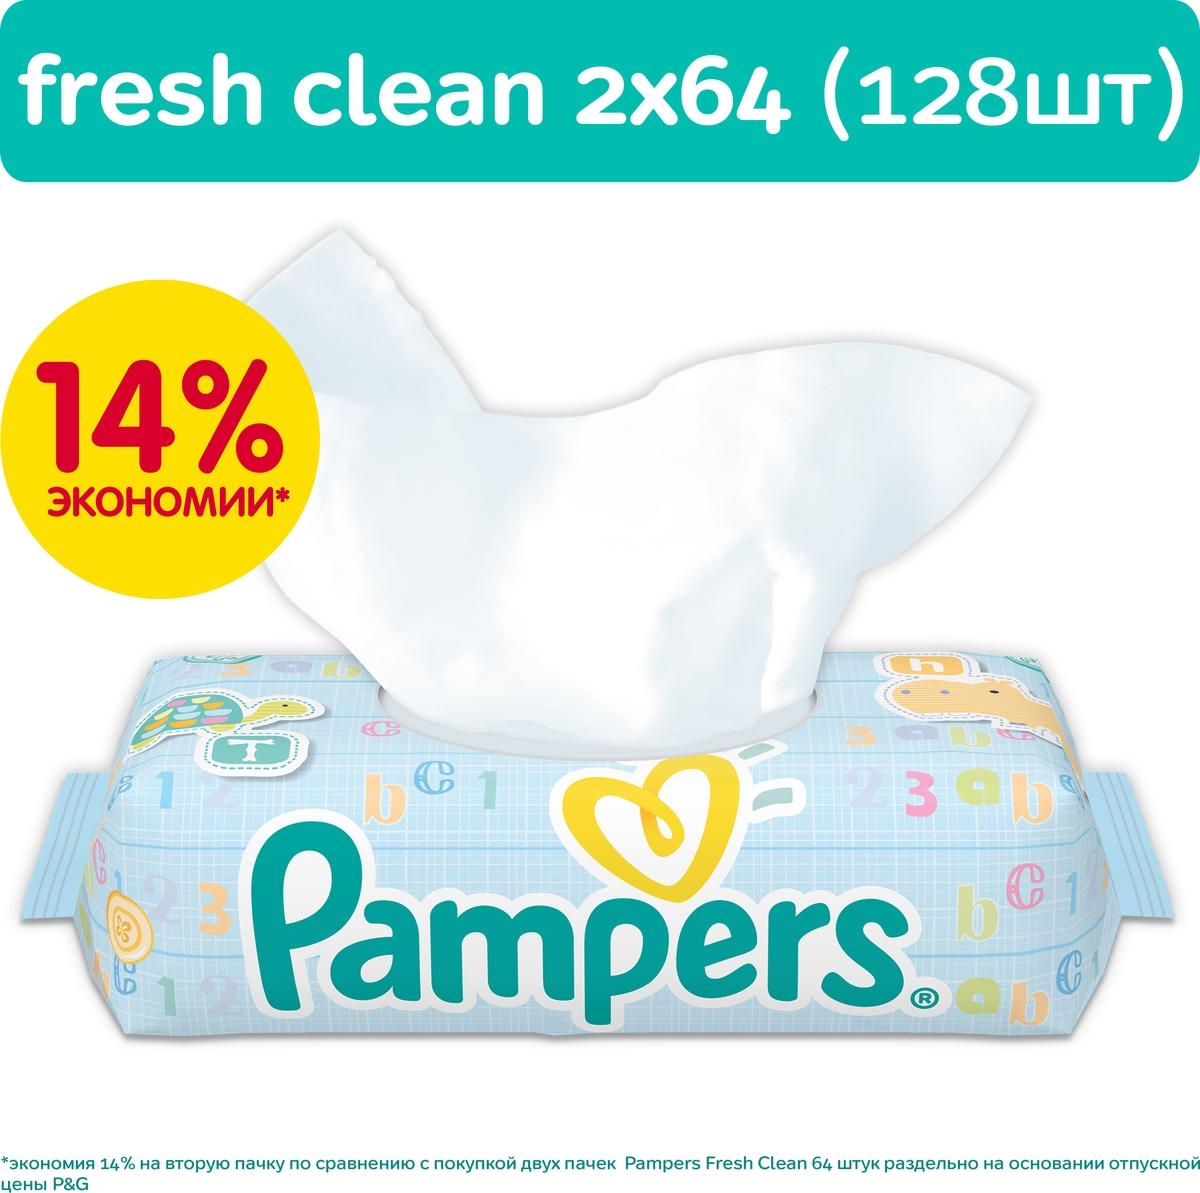 Pampers Детские влажные салфетки Baby Fresh Clean 128 шт